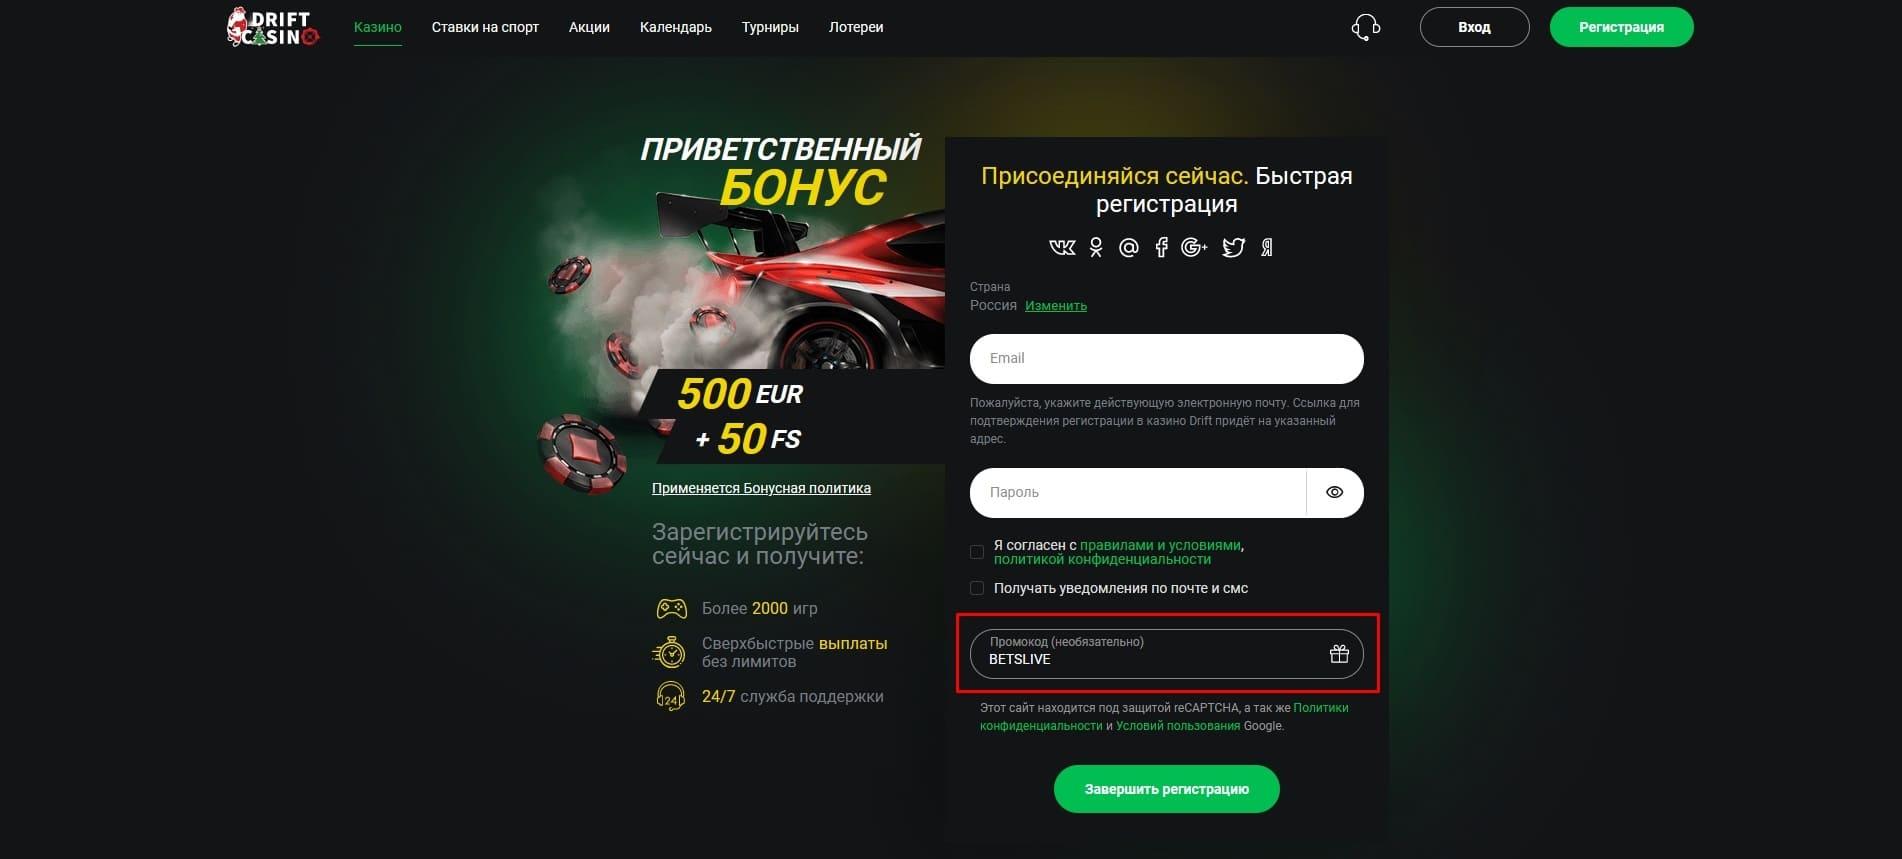 Казино Дрифт промокод